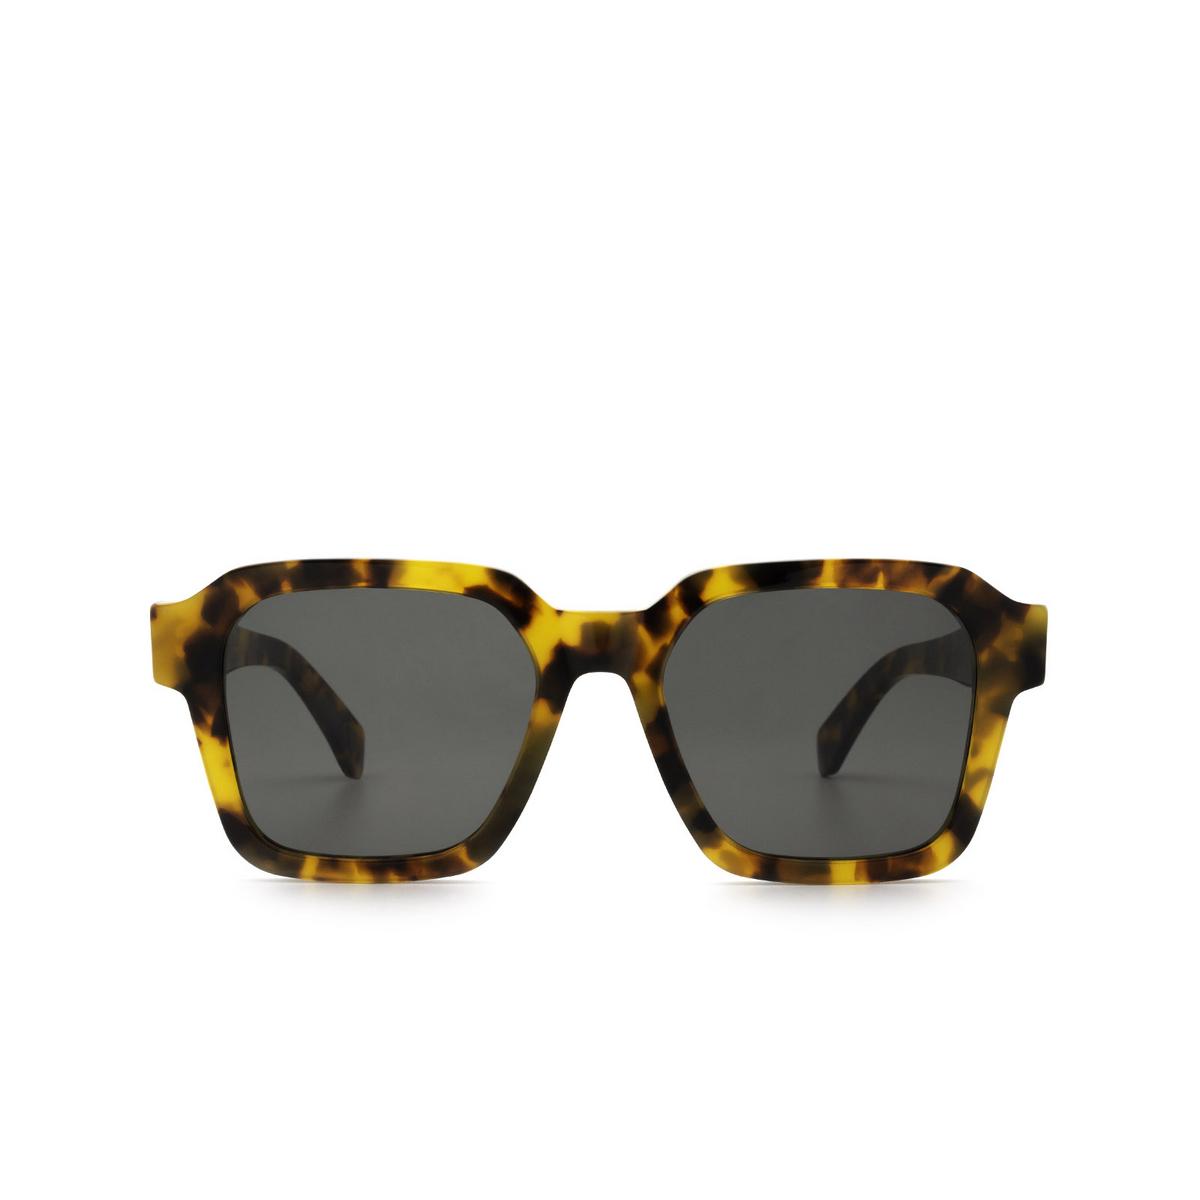 Retrosuperfuture® Square Sunglasses: Vasto color Spotted Havana 0CG - front view.